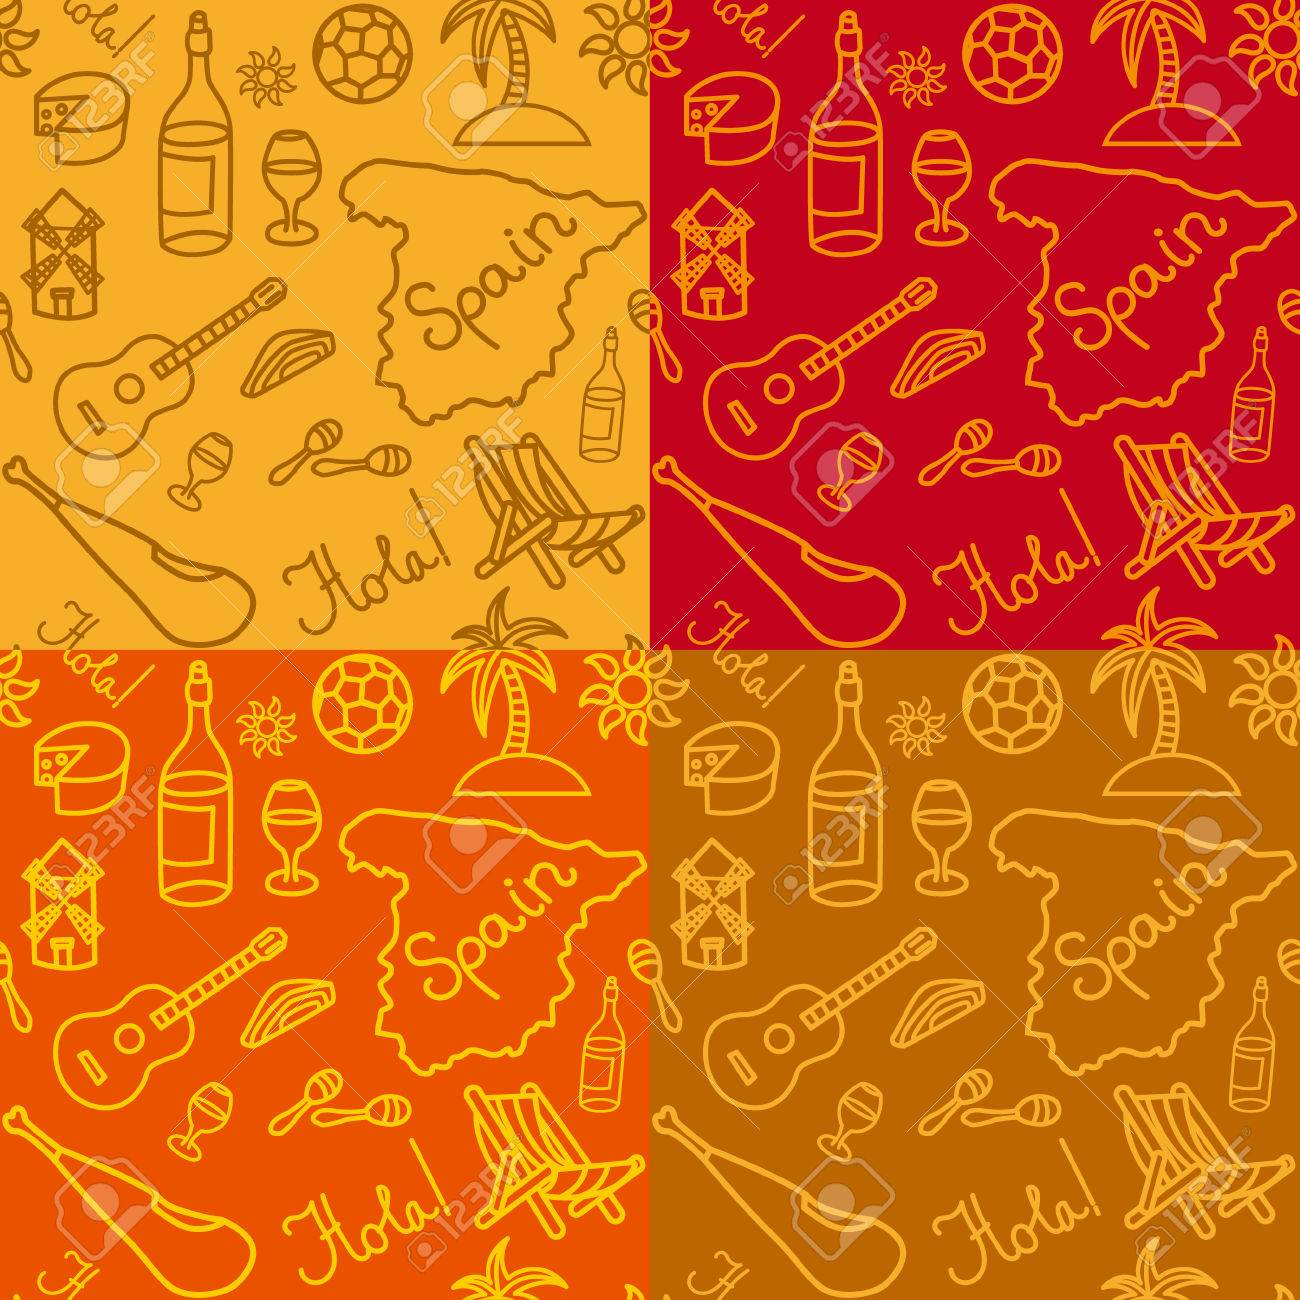 Illustration of spanish culture seamless pattern background illustration of spanish culture seamless pattern background stock vector 67744452 voltagebd Gallery